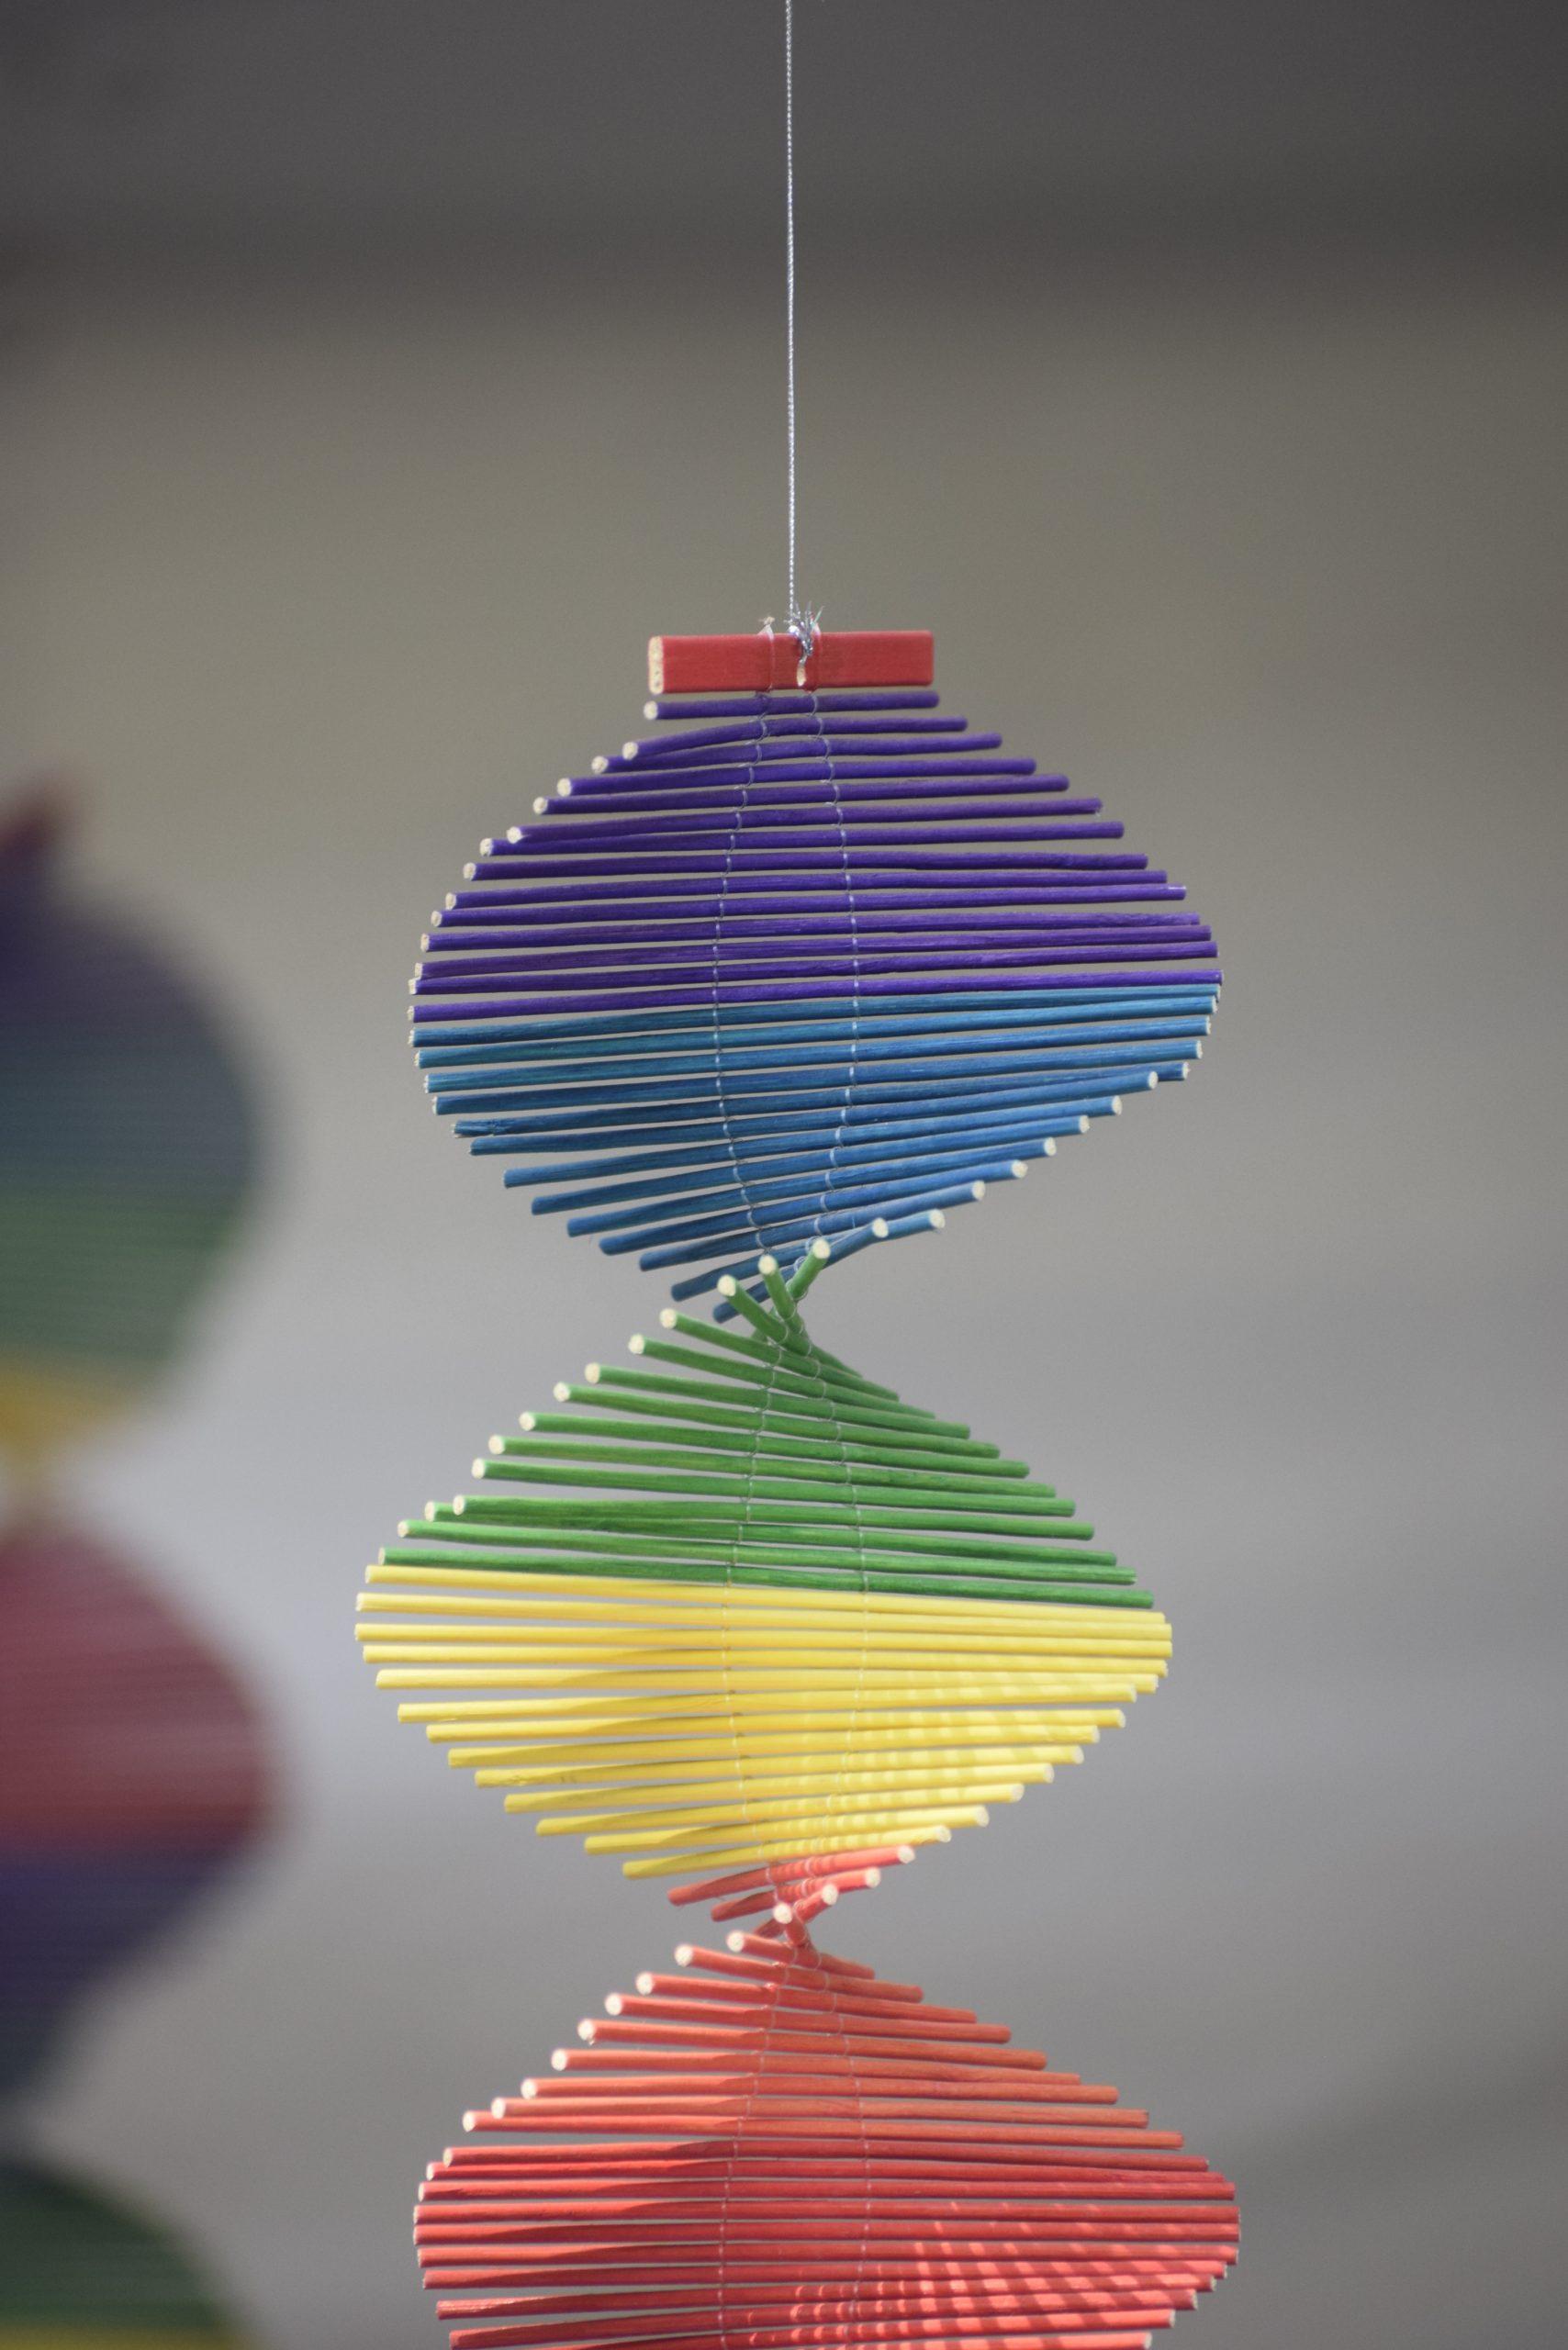 Colorful Decoration on Focus